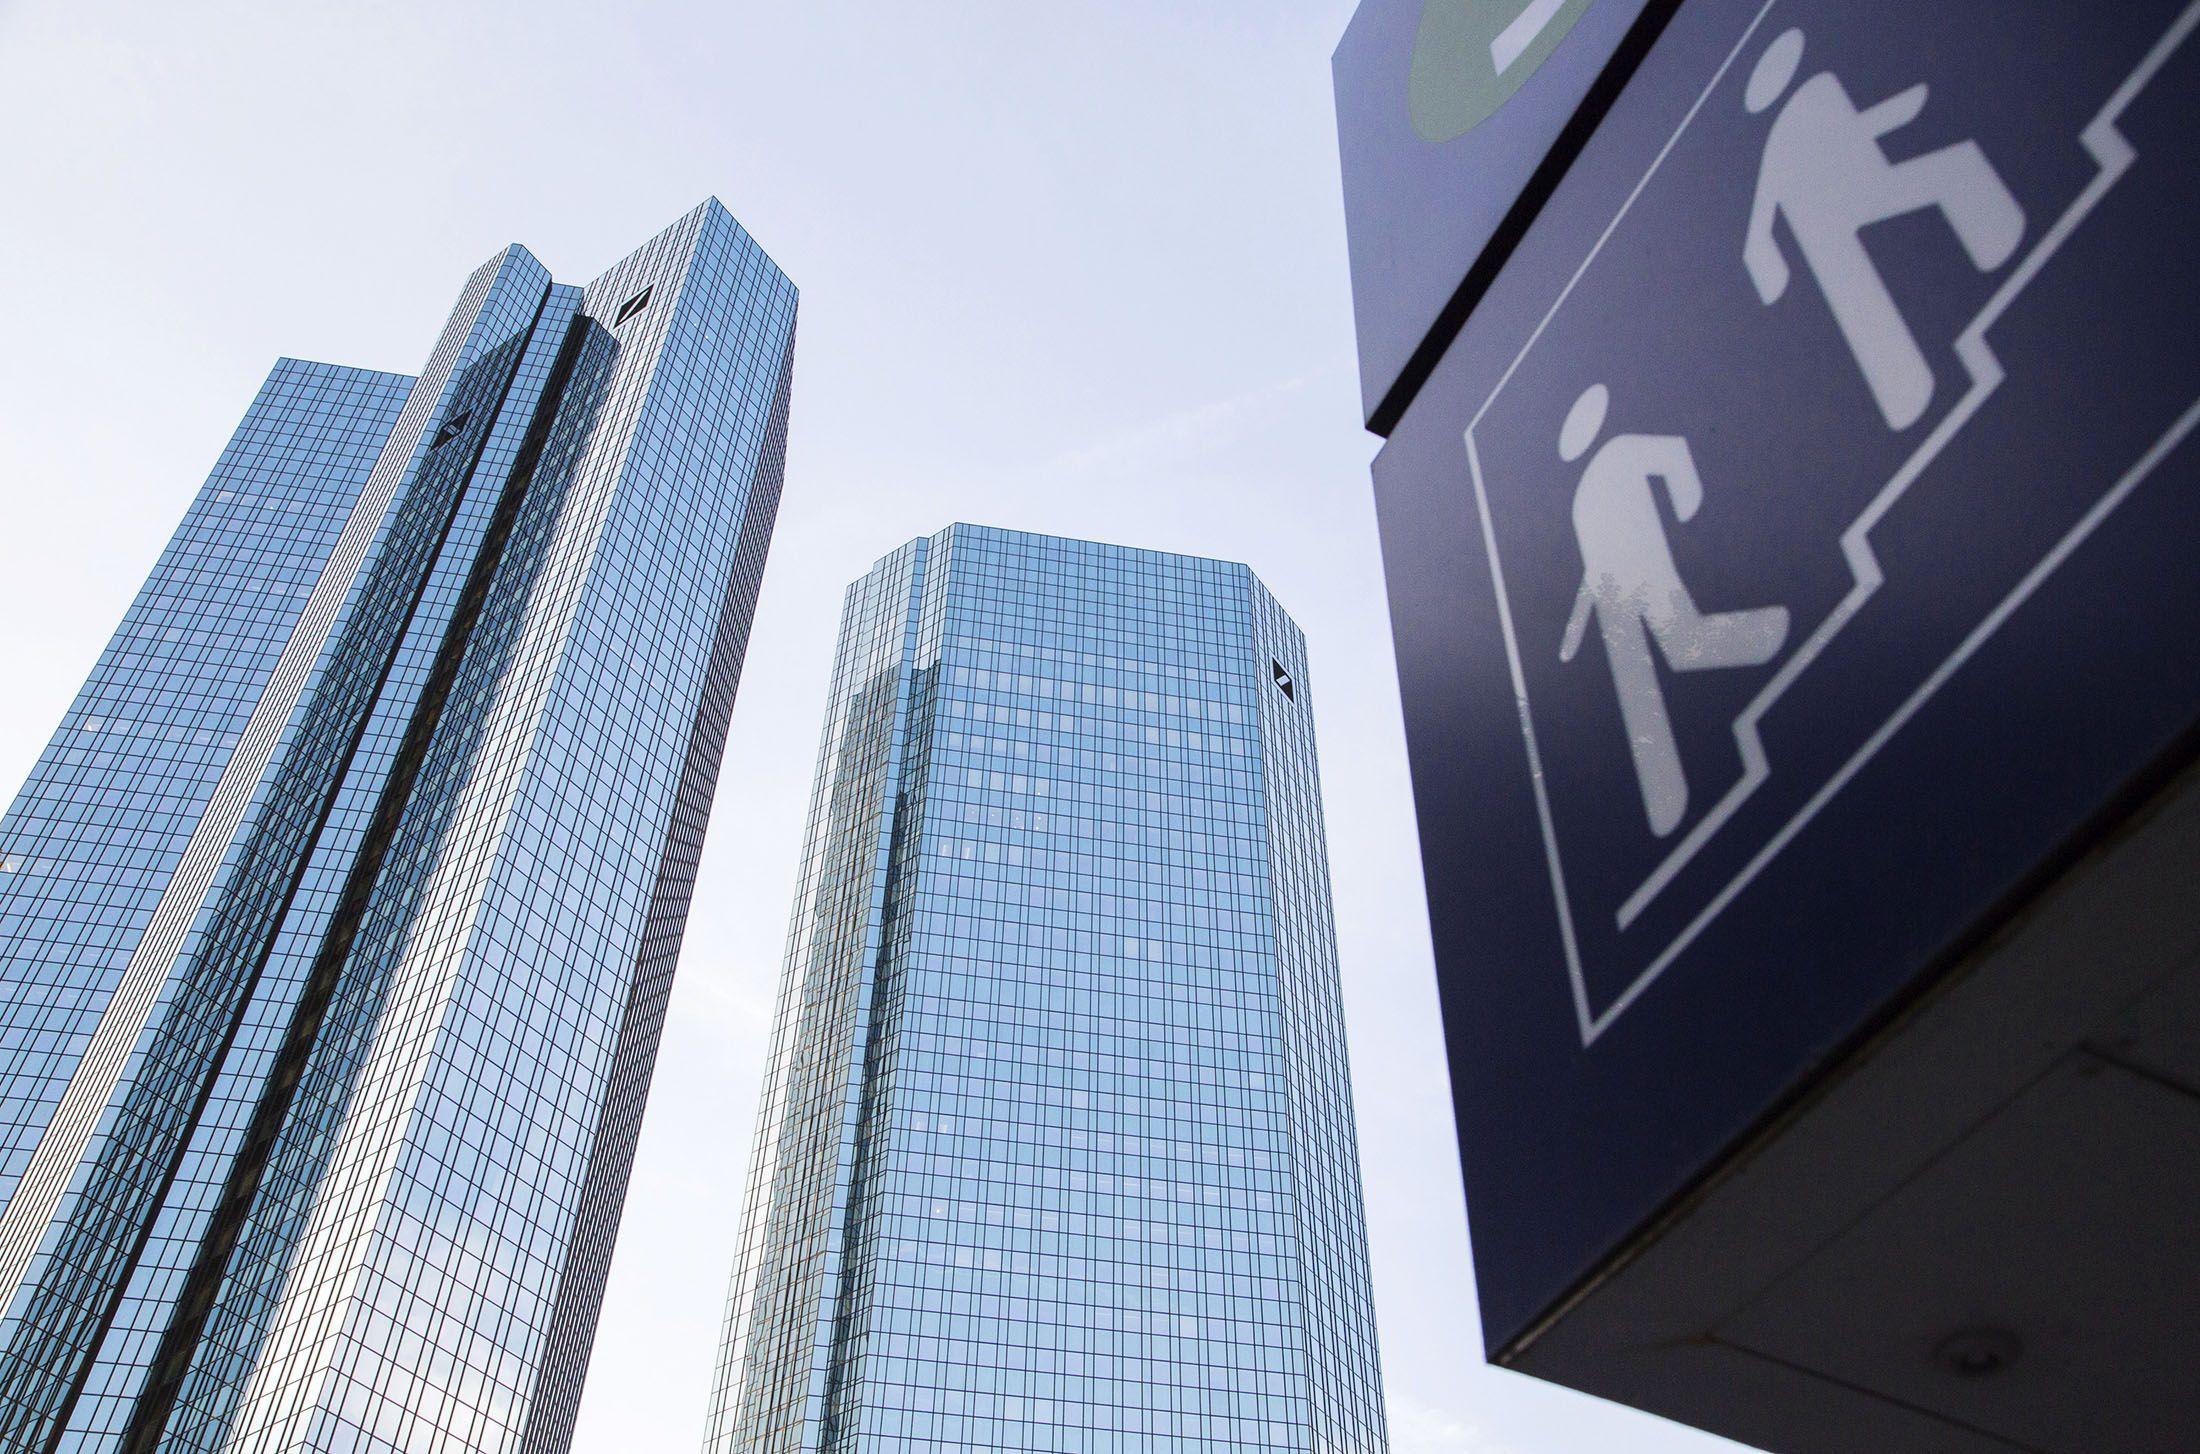 Deutsche Bank Tumbles as DoJ Claim of 14 Billion Rebuffed